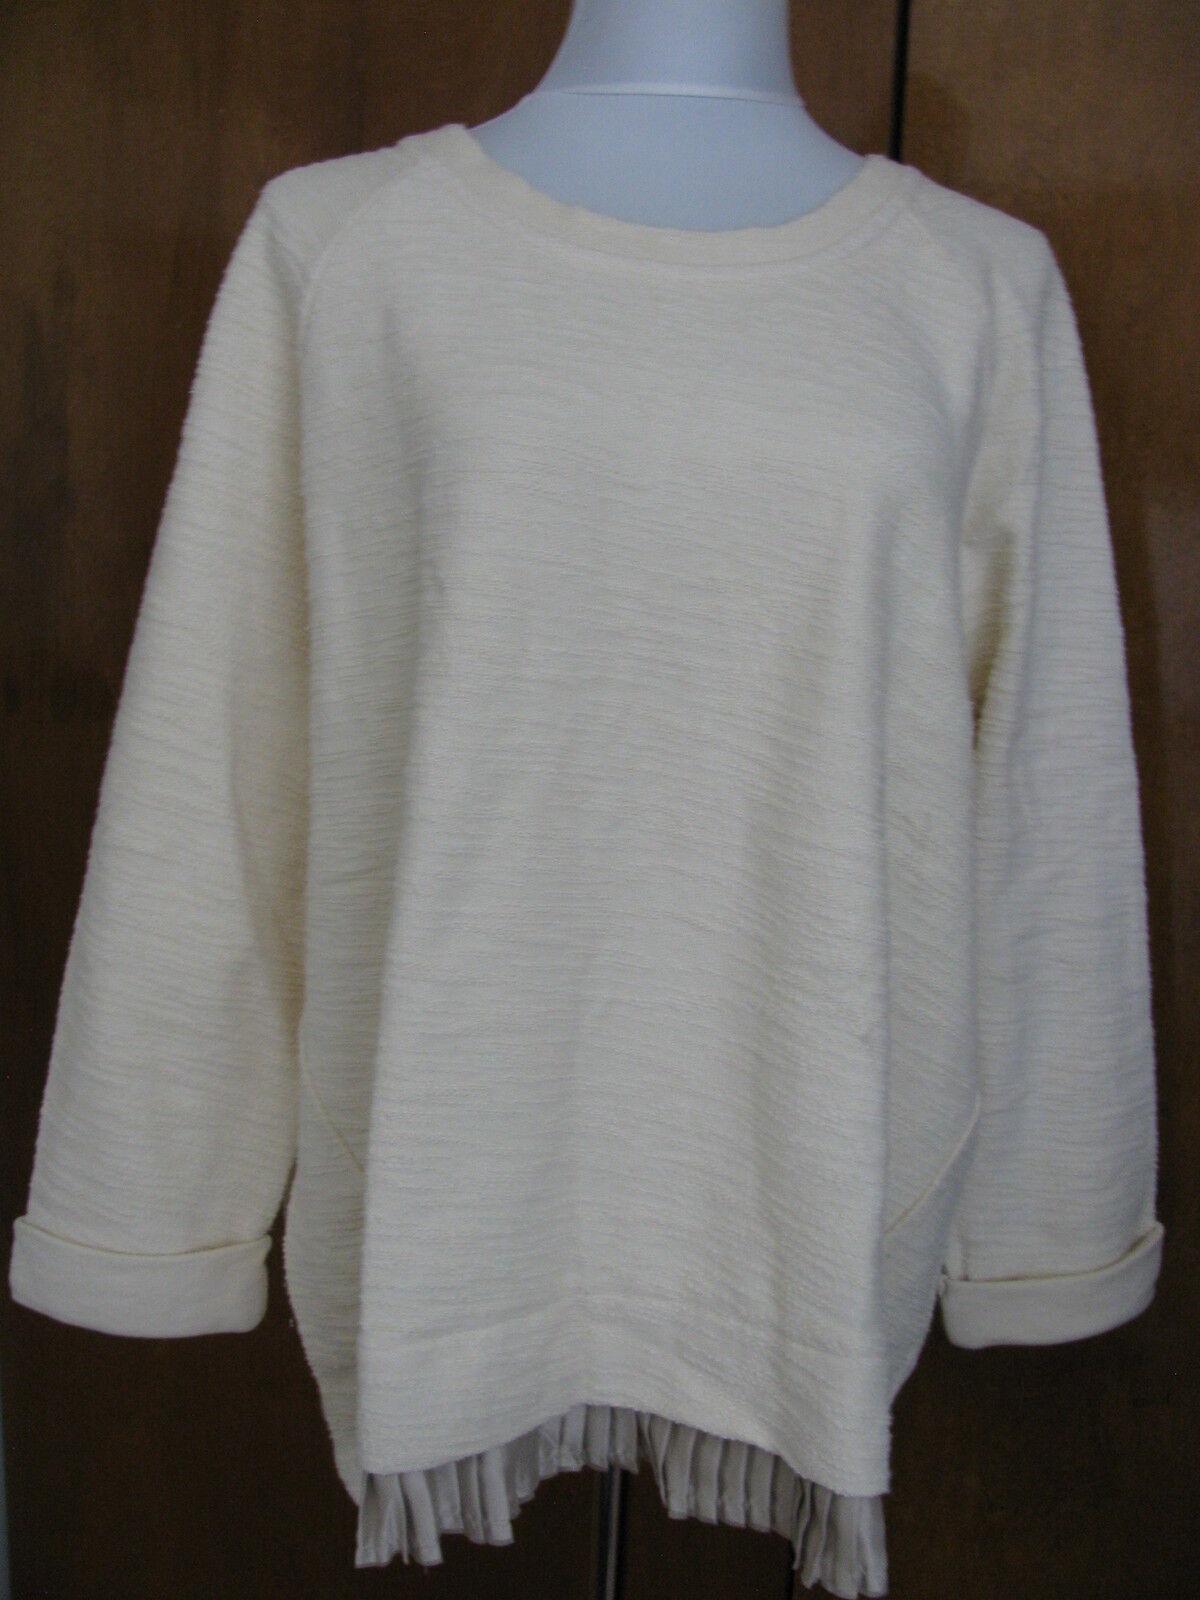 Anthropologie undiscovered eye womens ivory pleat hem long sleeves sweater M NWT